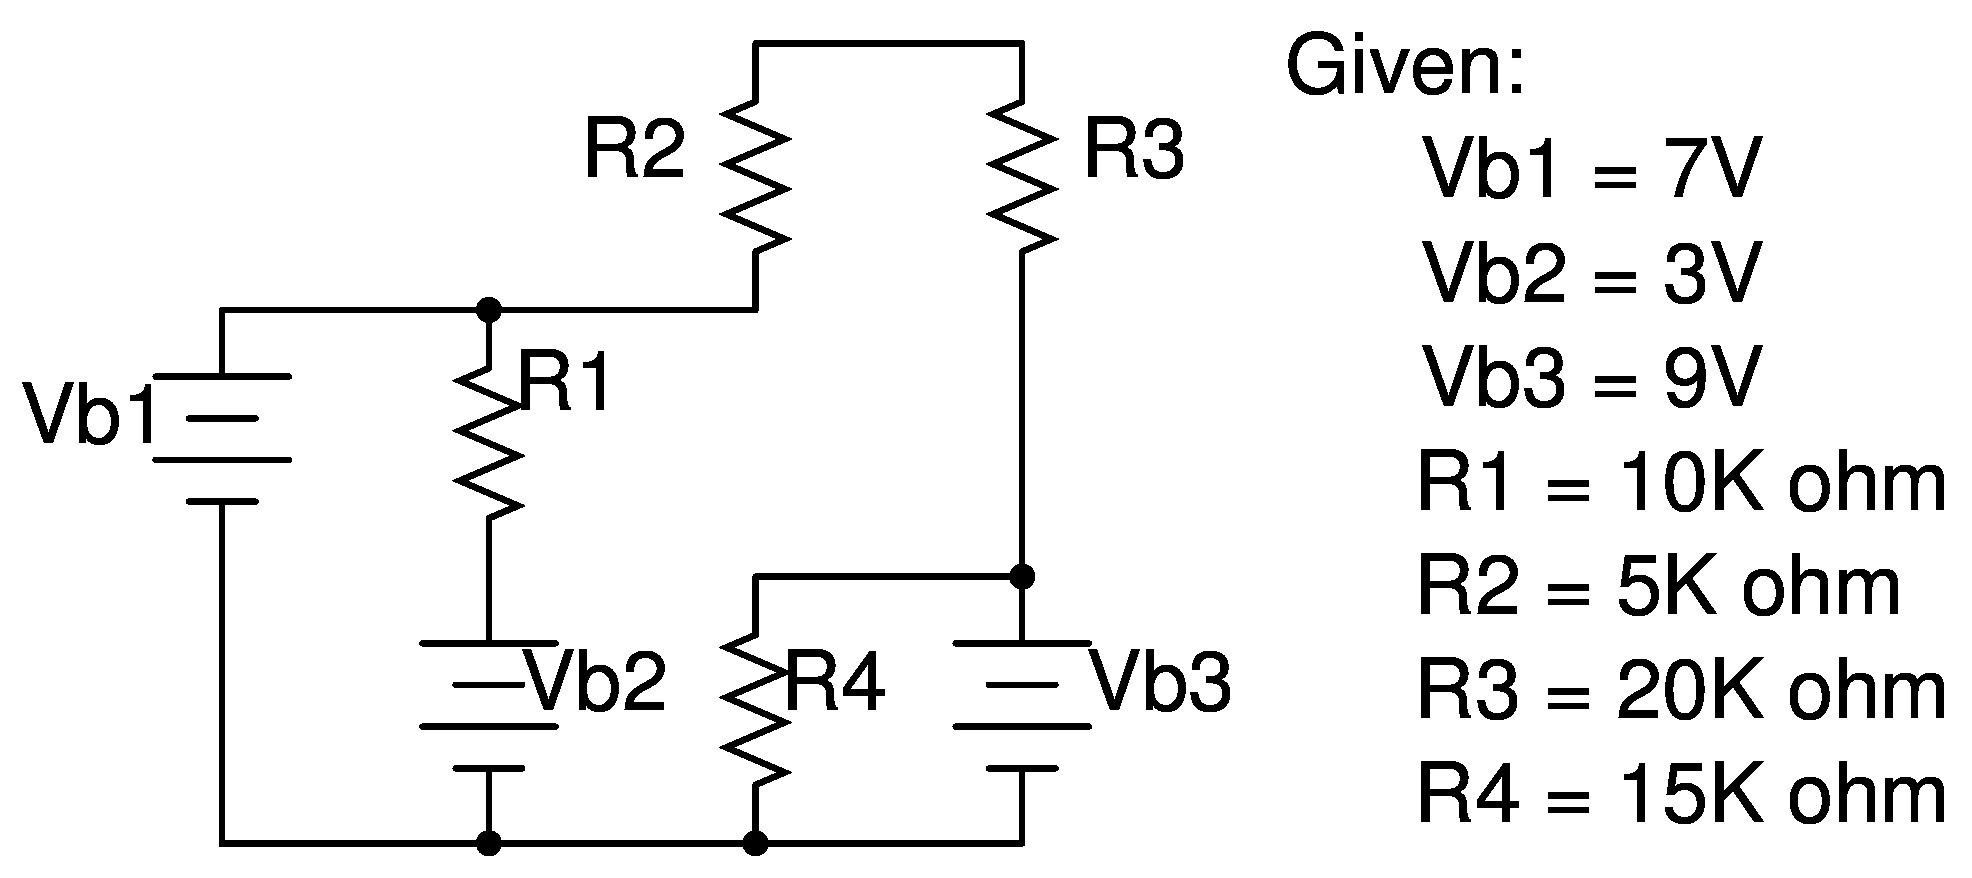 Circuit Diagram Exercises Wiring Data Automotive Relay Schematics Symbols Auto Electrical